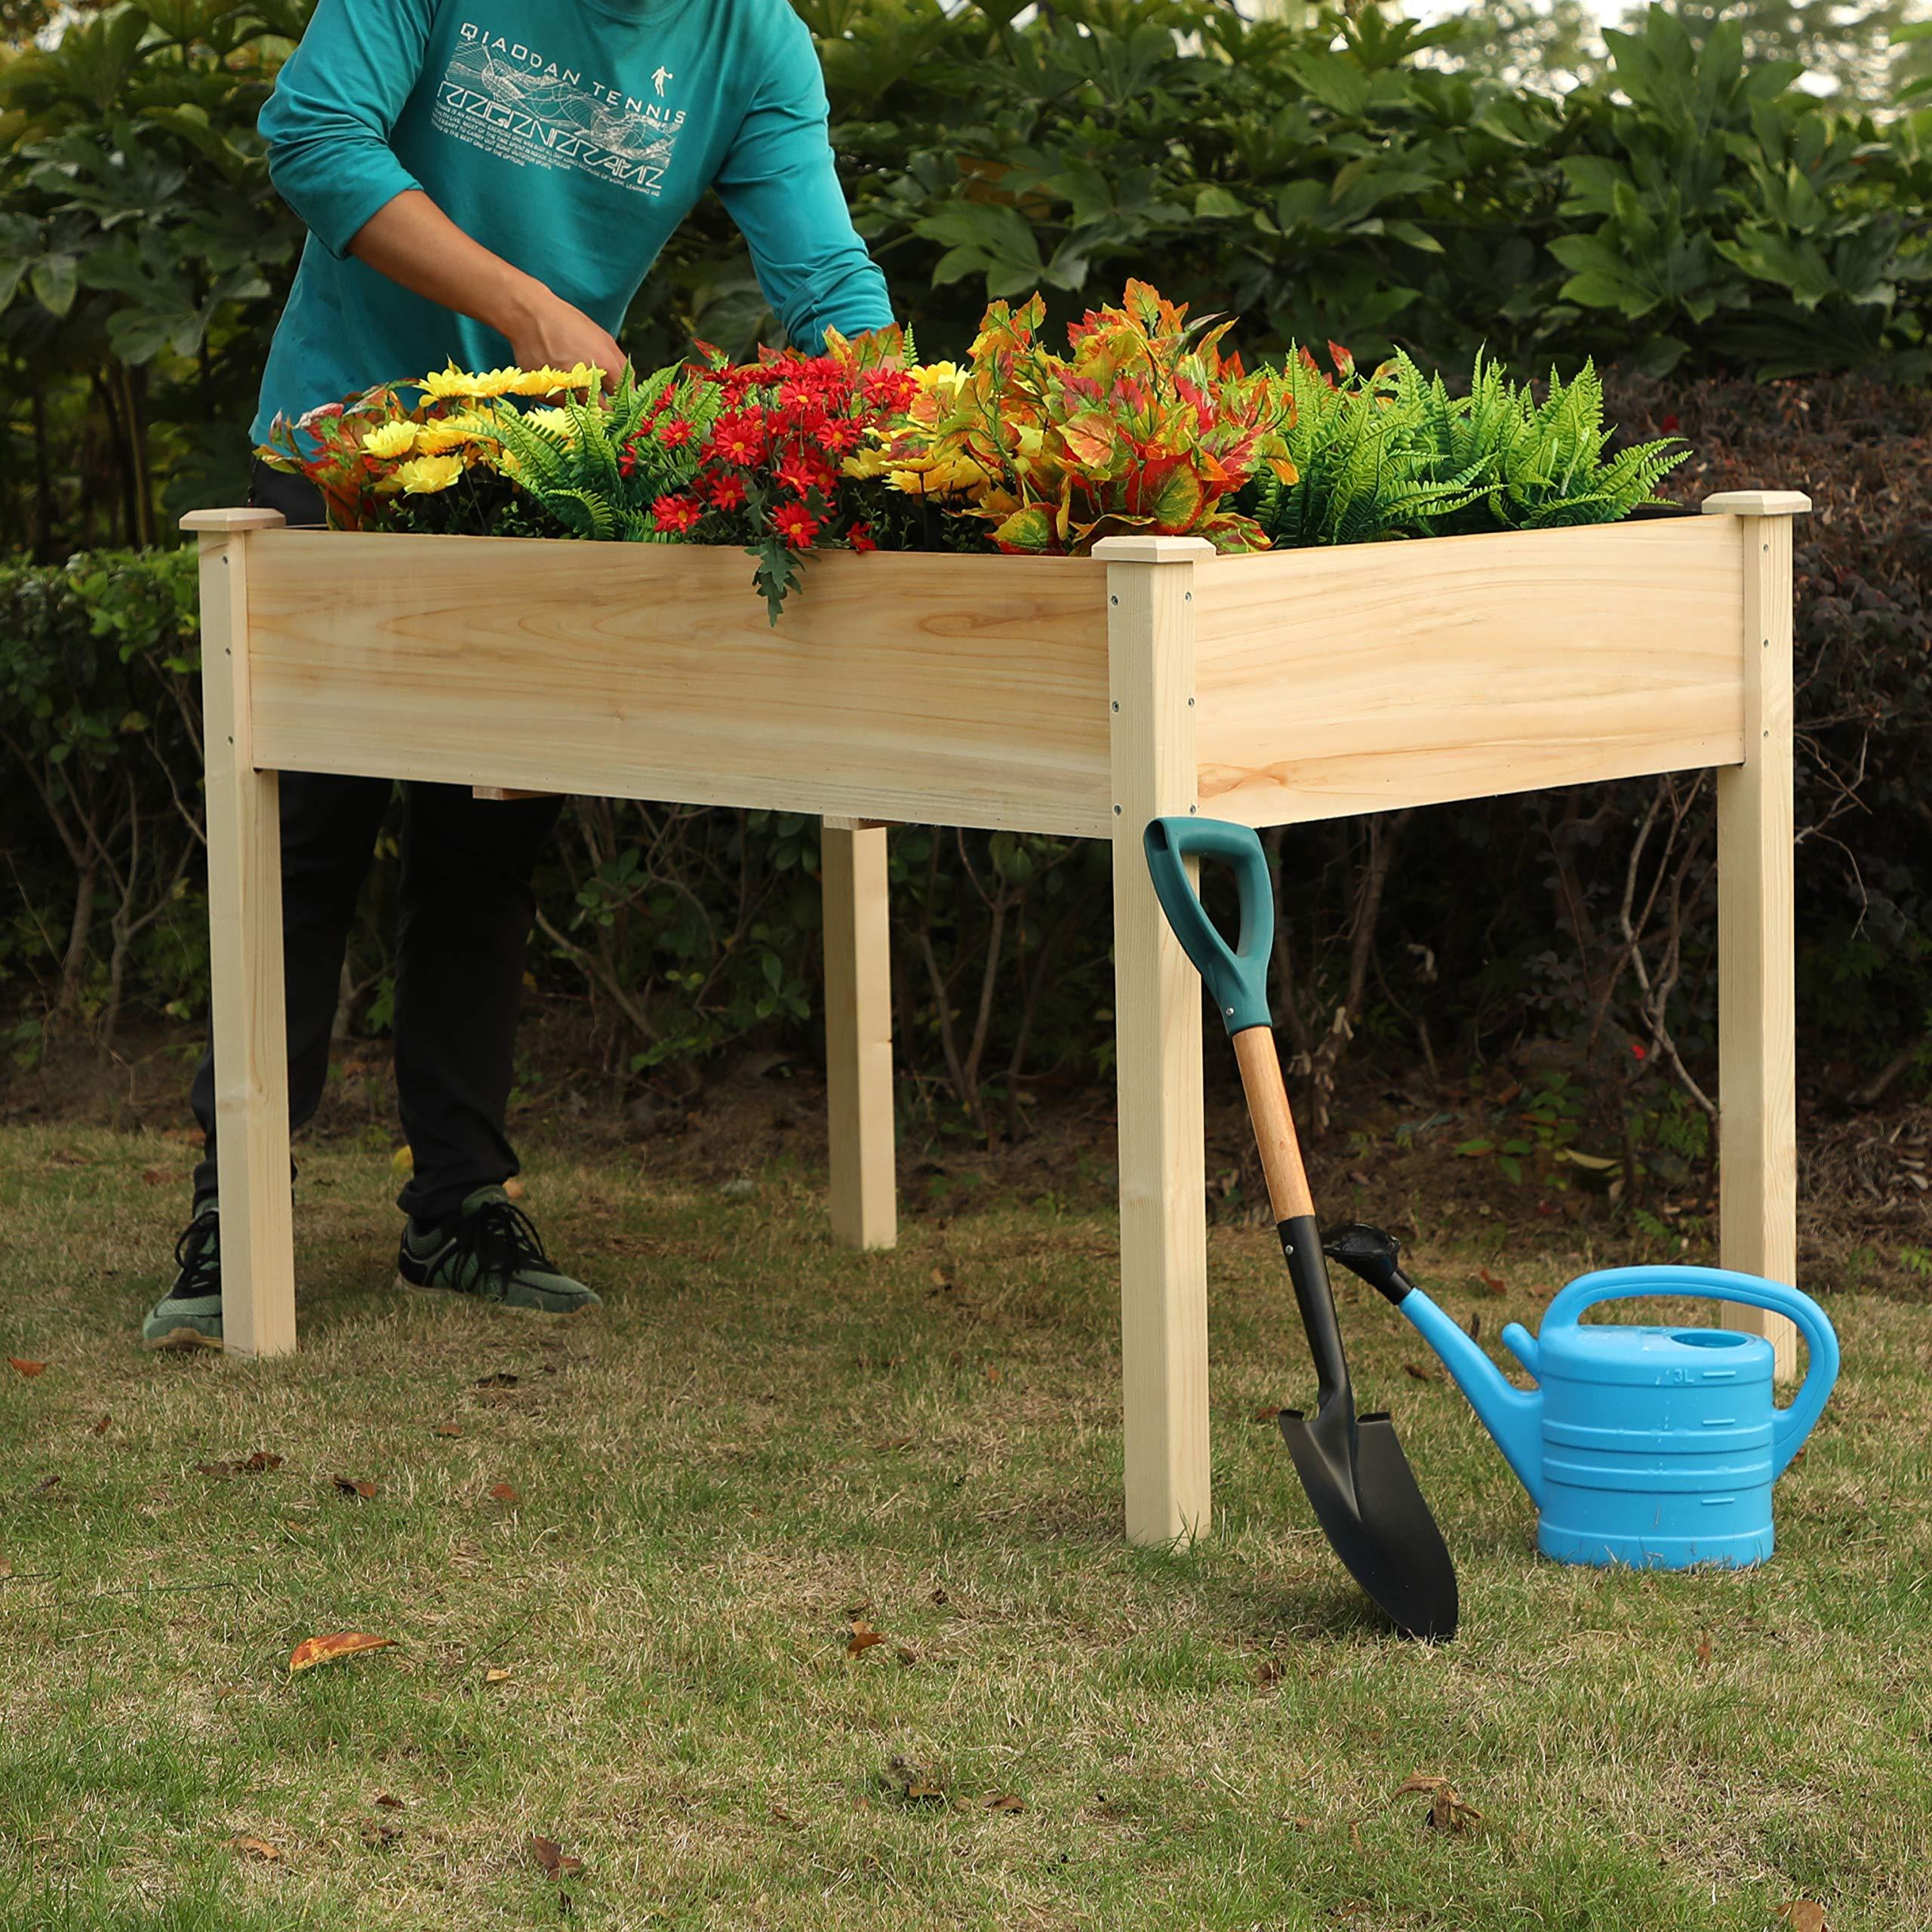 PHI VILLA Raised Garden Bed Elevated Planter Box for Vegetable/Flower/Fruit/Herb (50.4''x31''x26.8'')